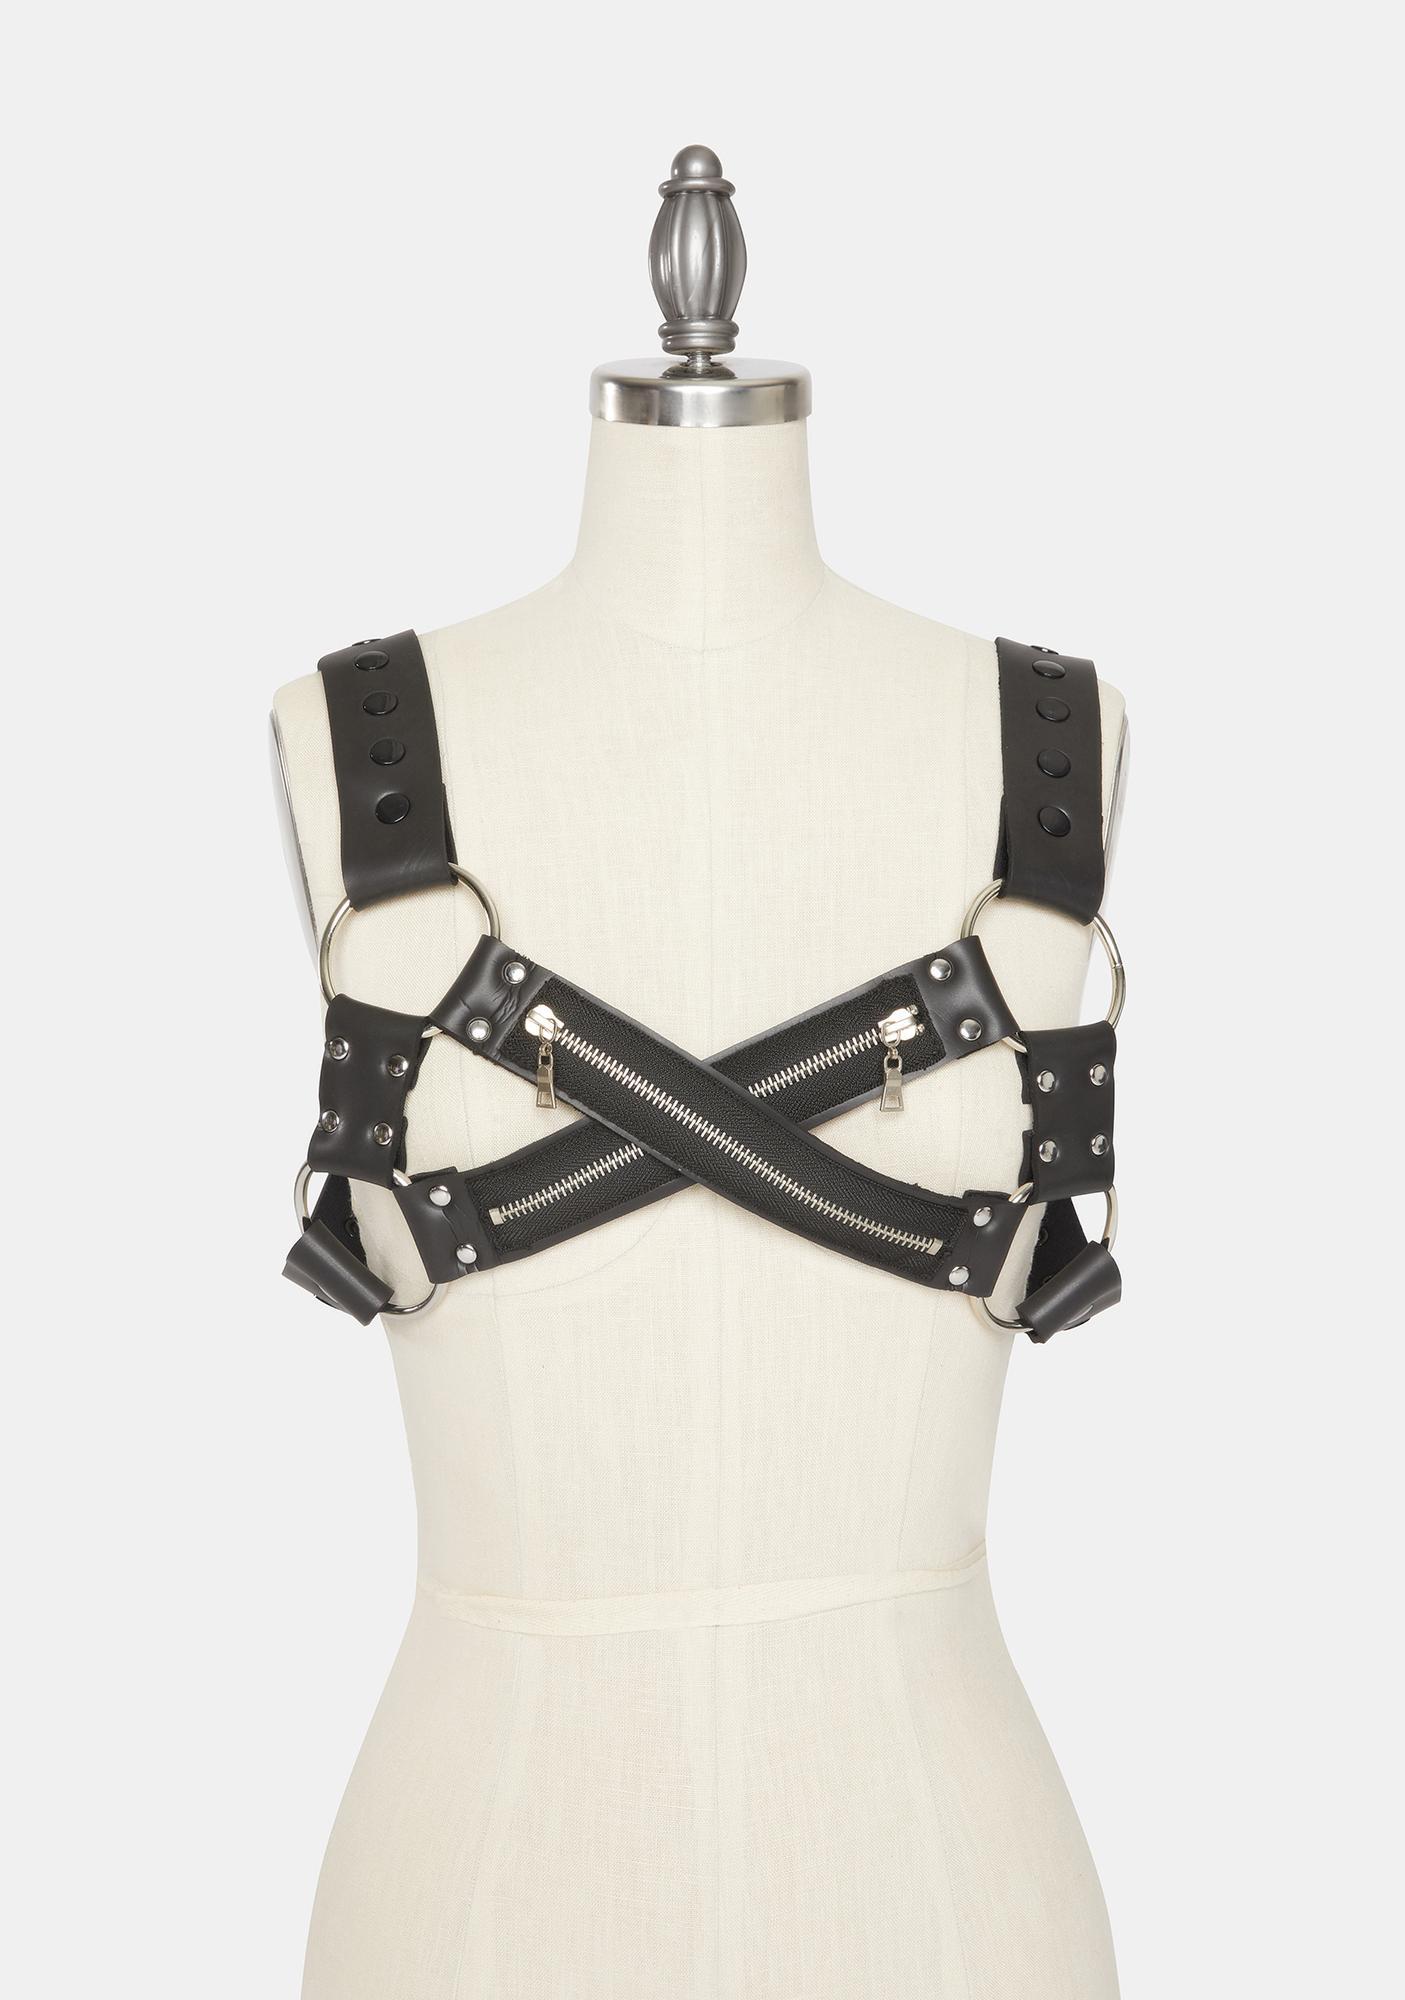 Zip It O-Ring Body Harness